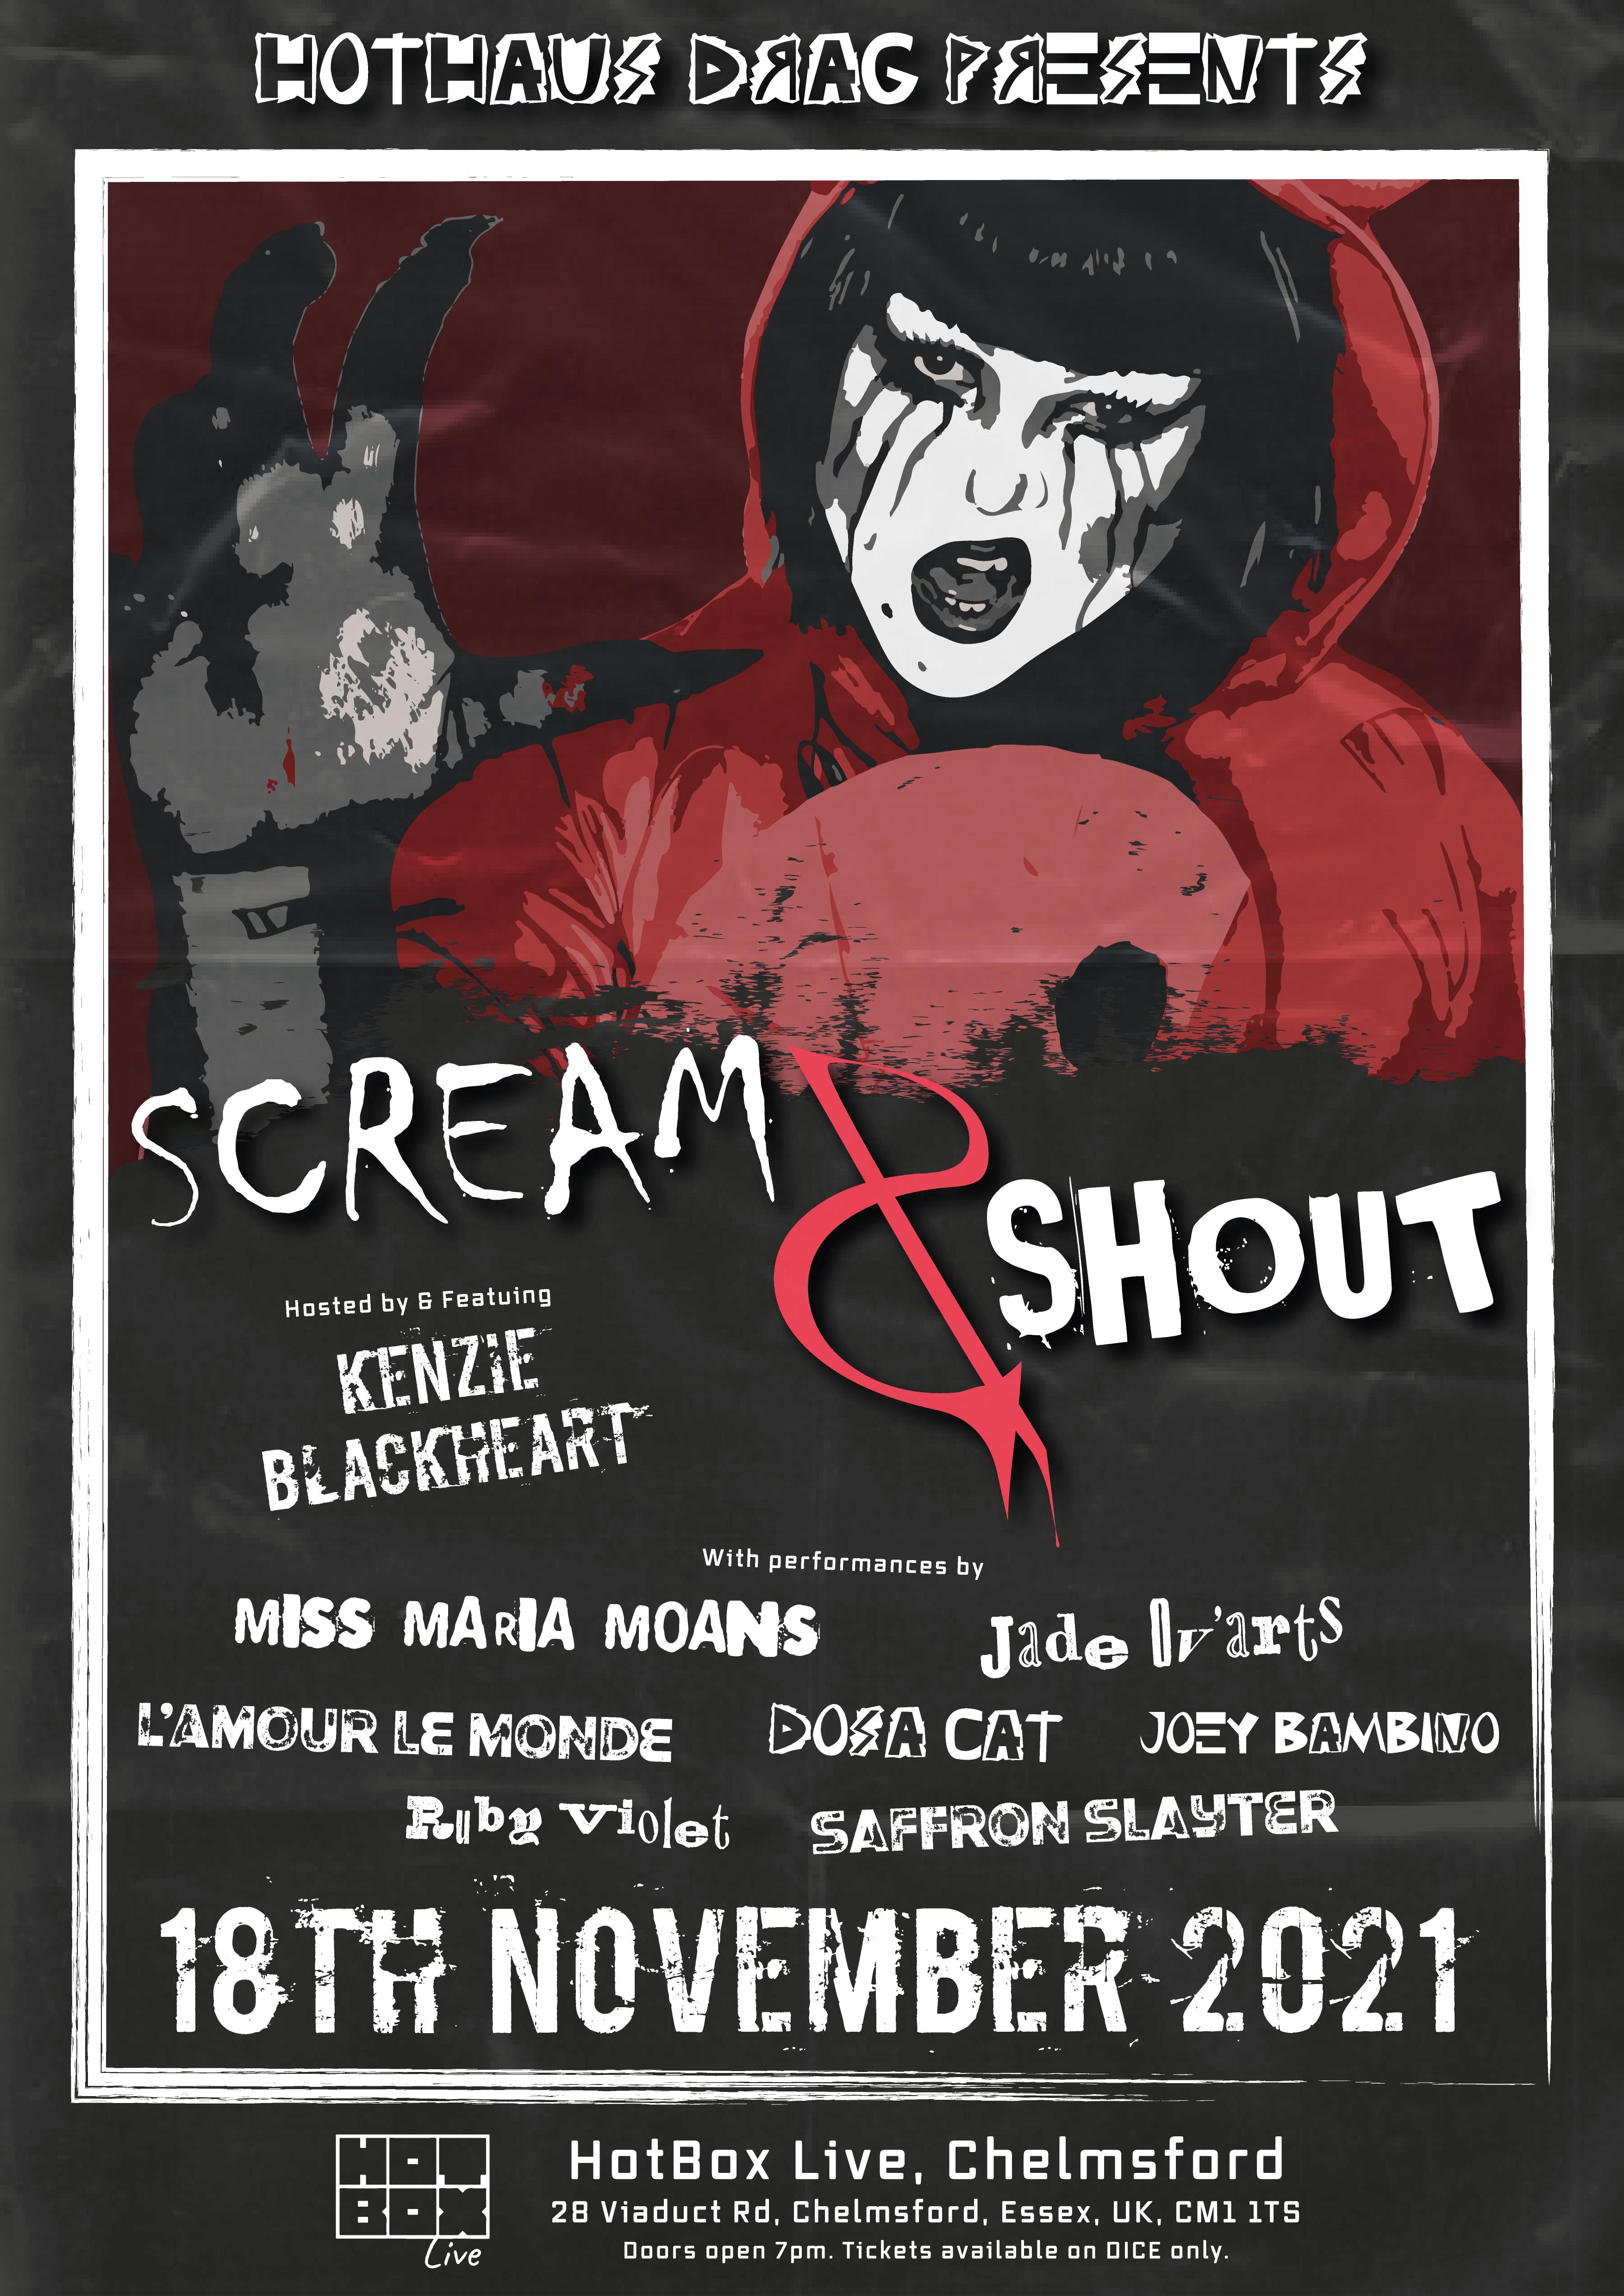 HOTHAUS DRAG PRESENTS: SCREAM & SHOUT